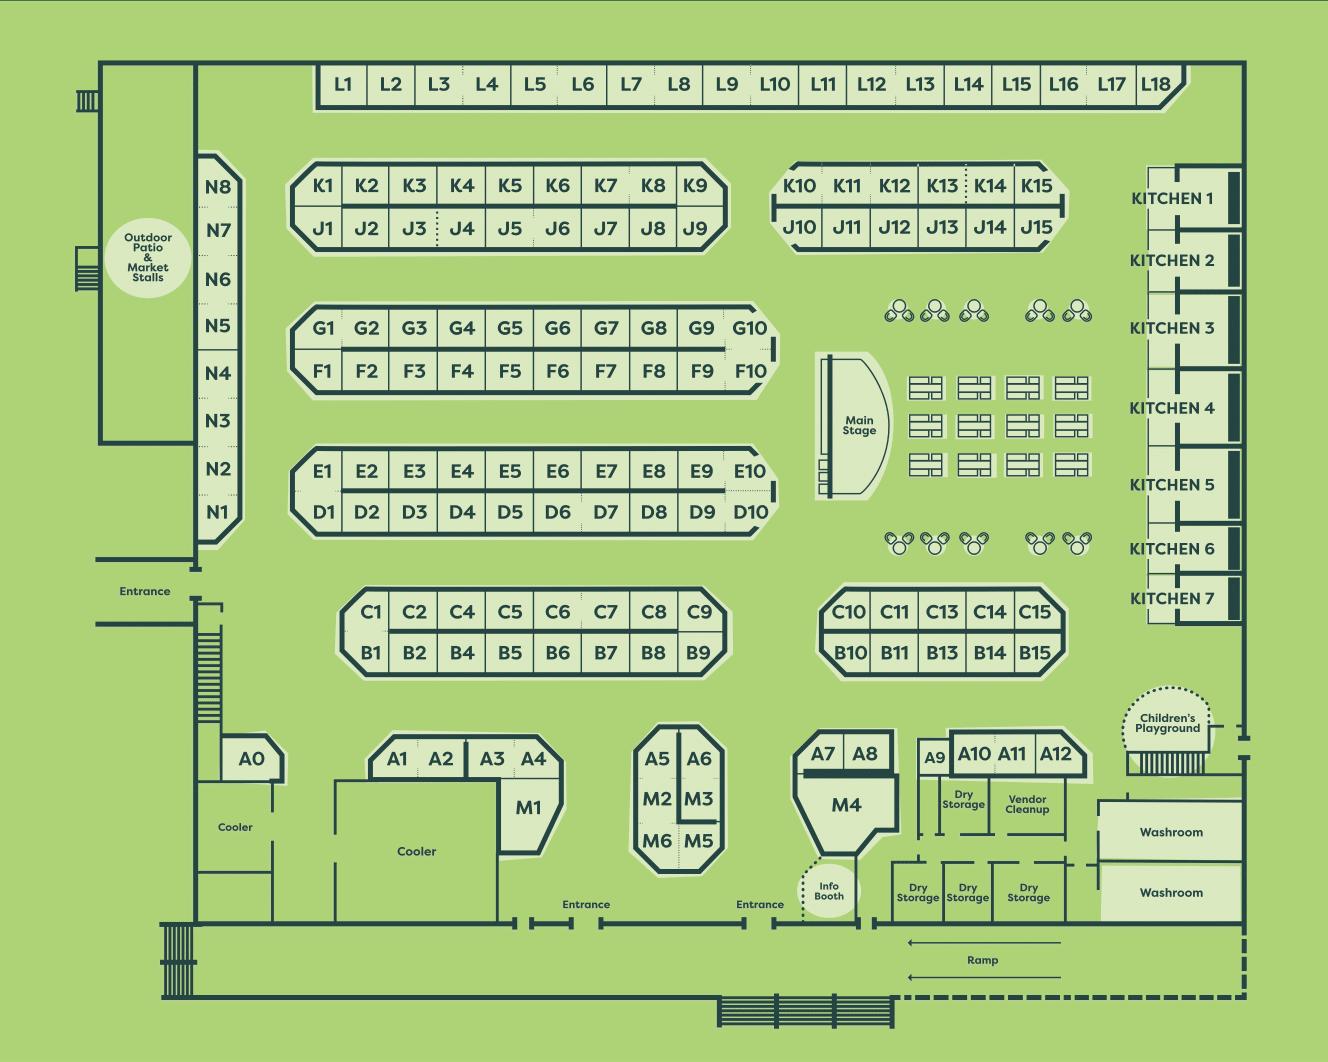 Bountiful Farmers' Market - Vendor Map